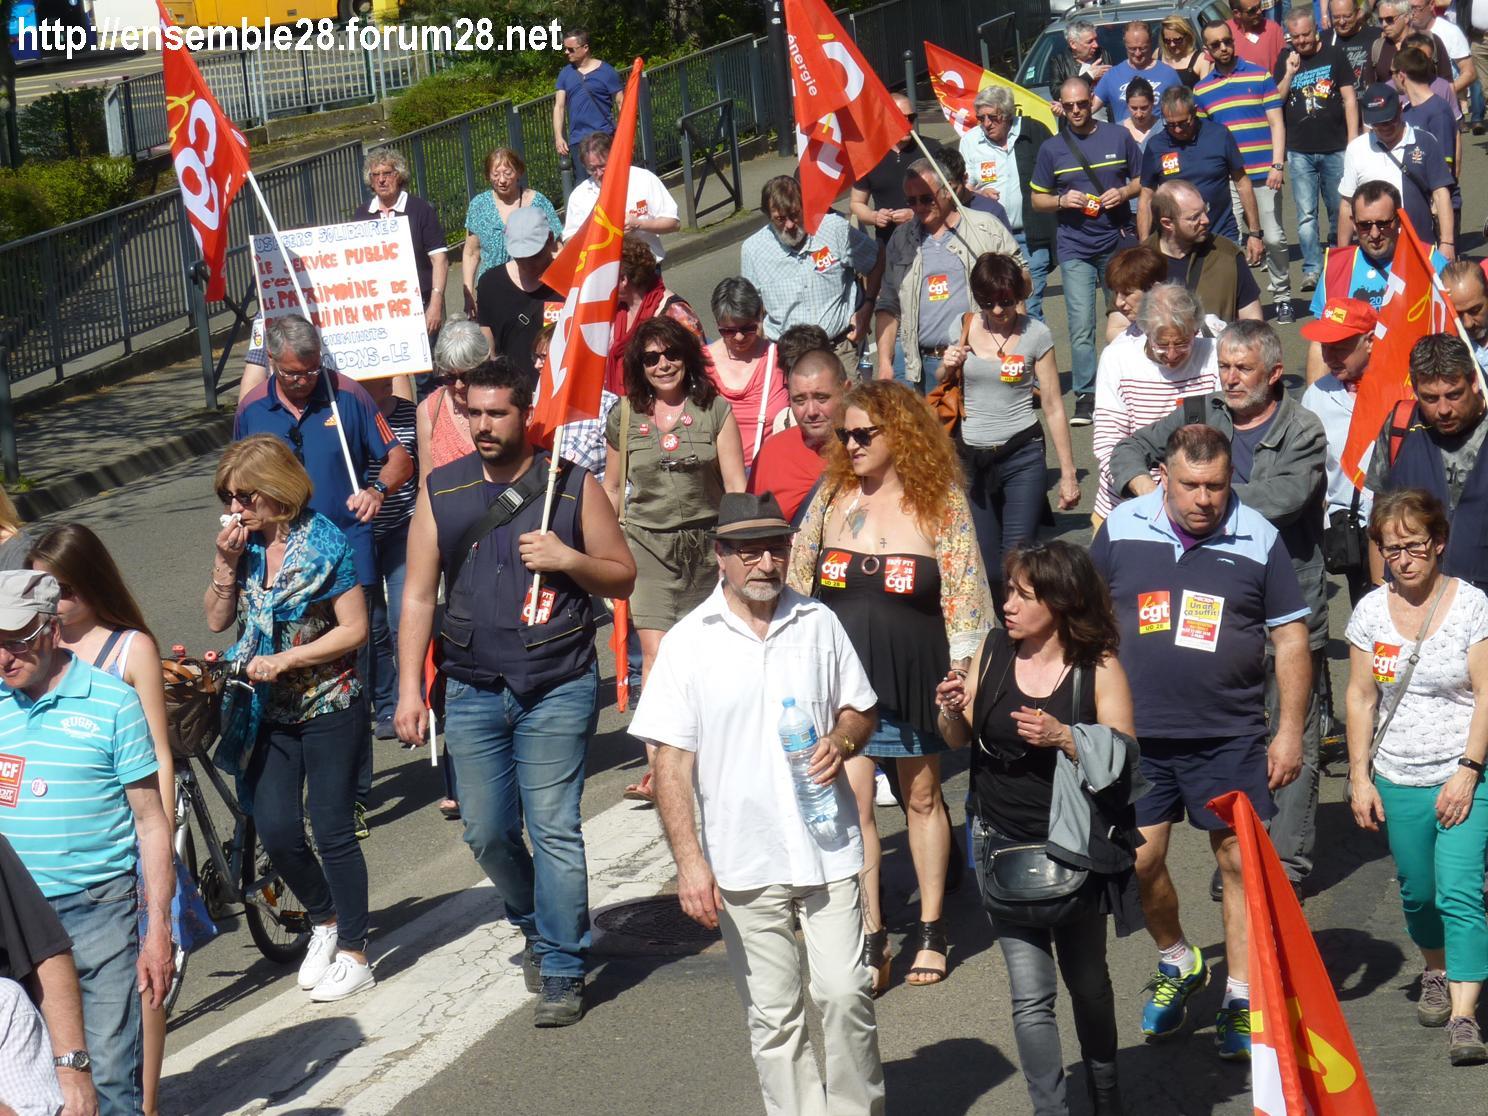 19-04-2018 Chartres Manifestation Interprofessionnelle CGT Solidaires SNES-FSU n°13